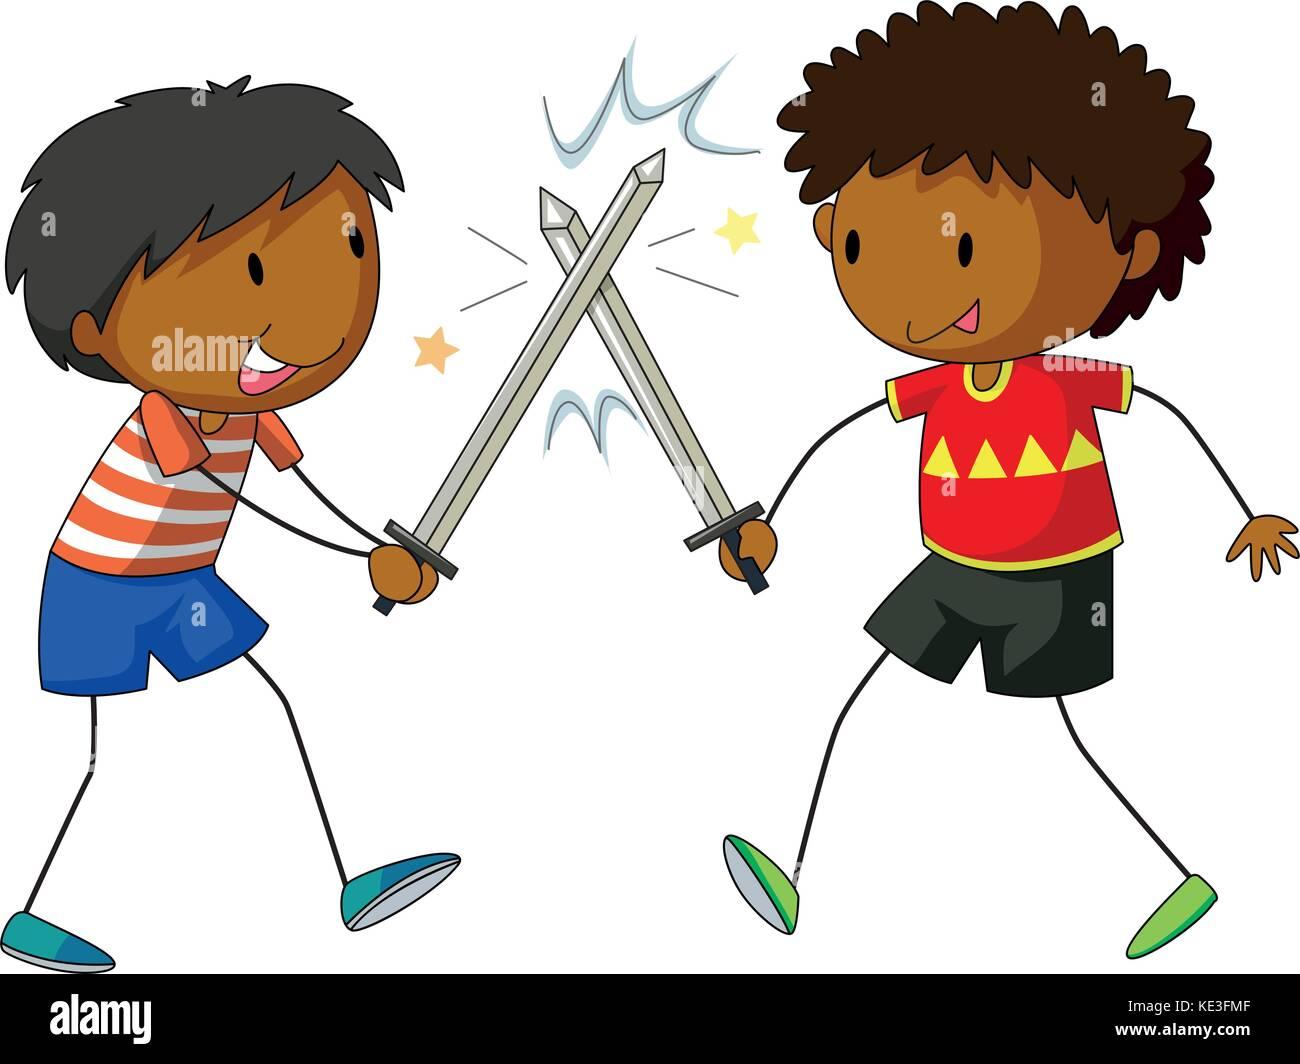 cartoon illustration two boys fighting stock photos & cartoon